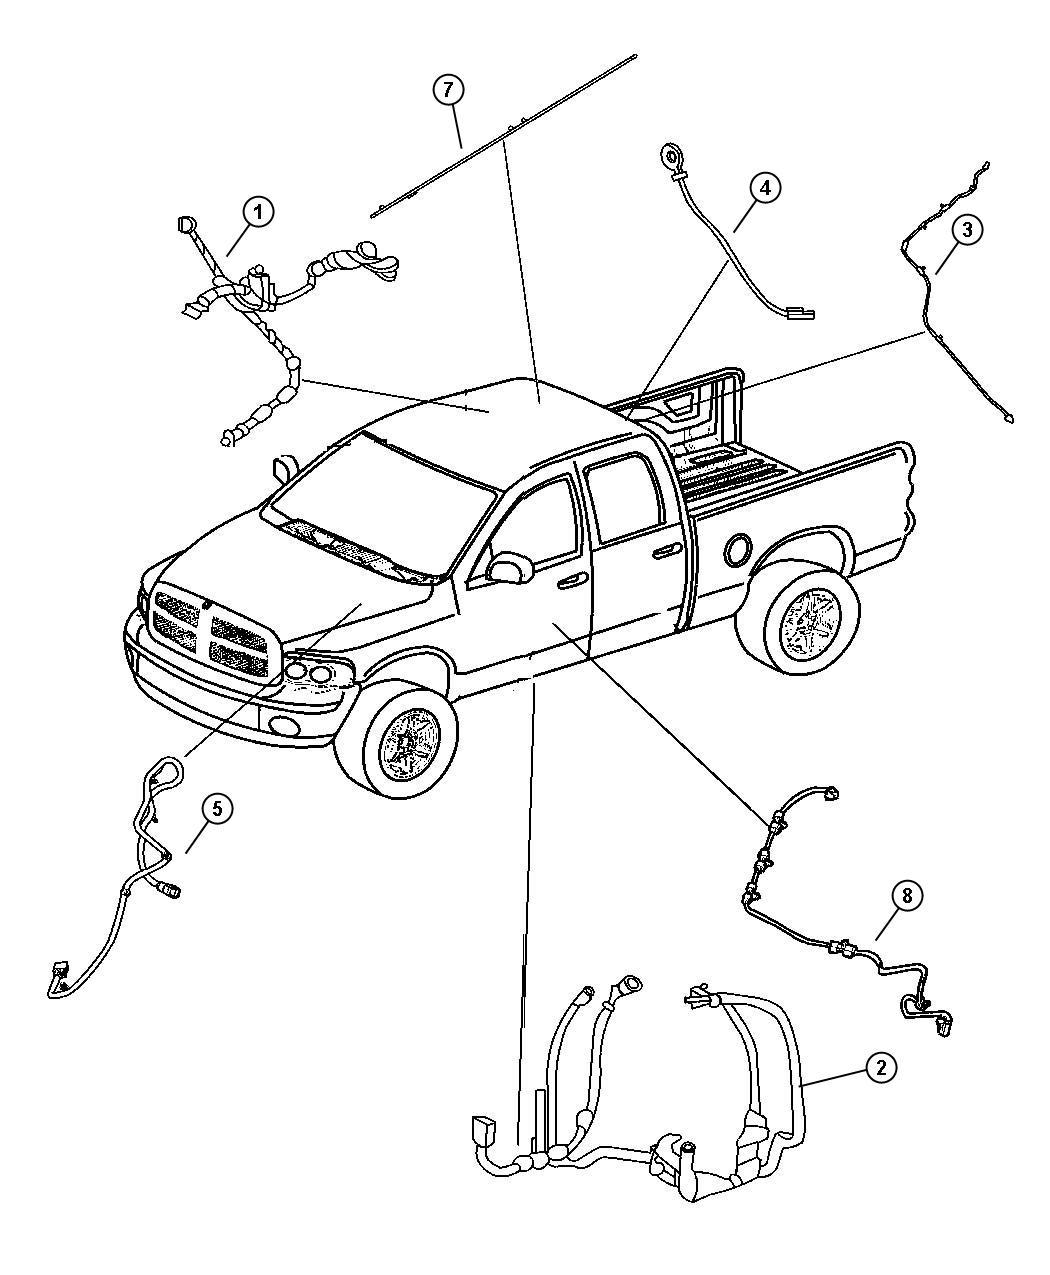 2008 Dodge Ram 4500 Wiring. Electric back light. [rear